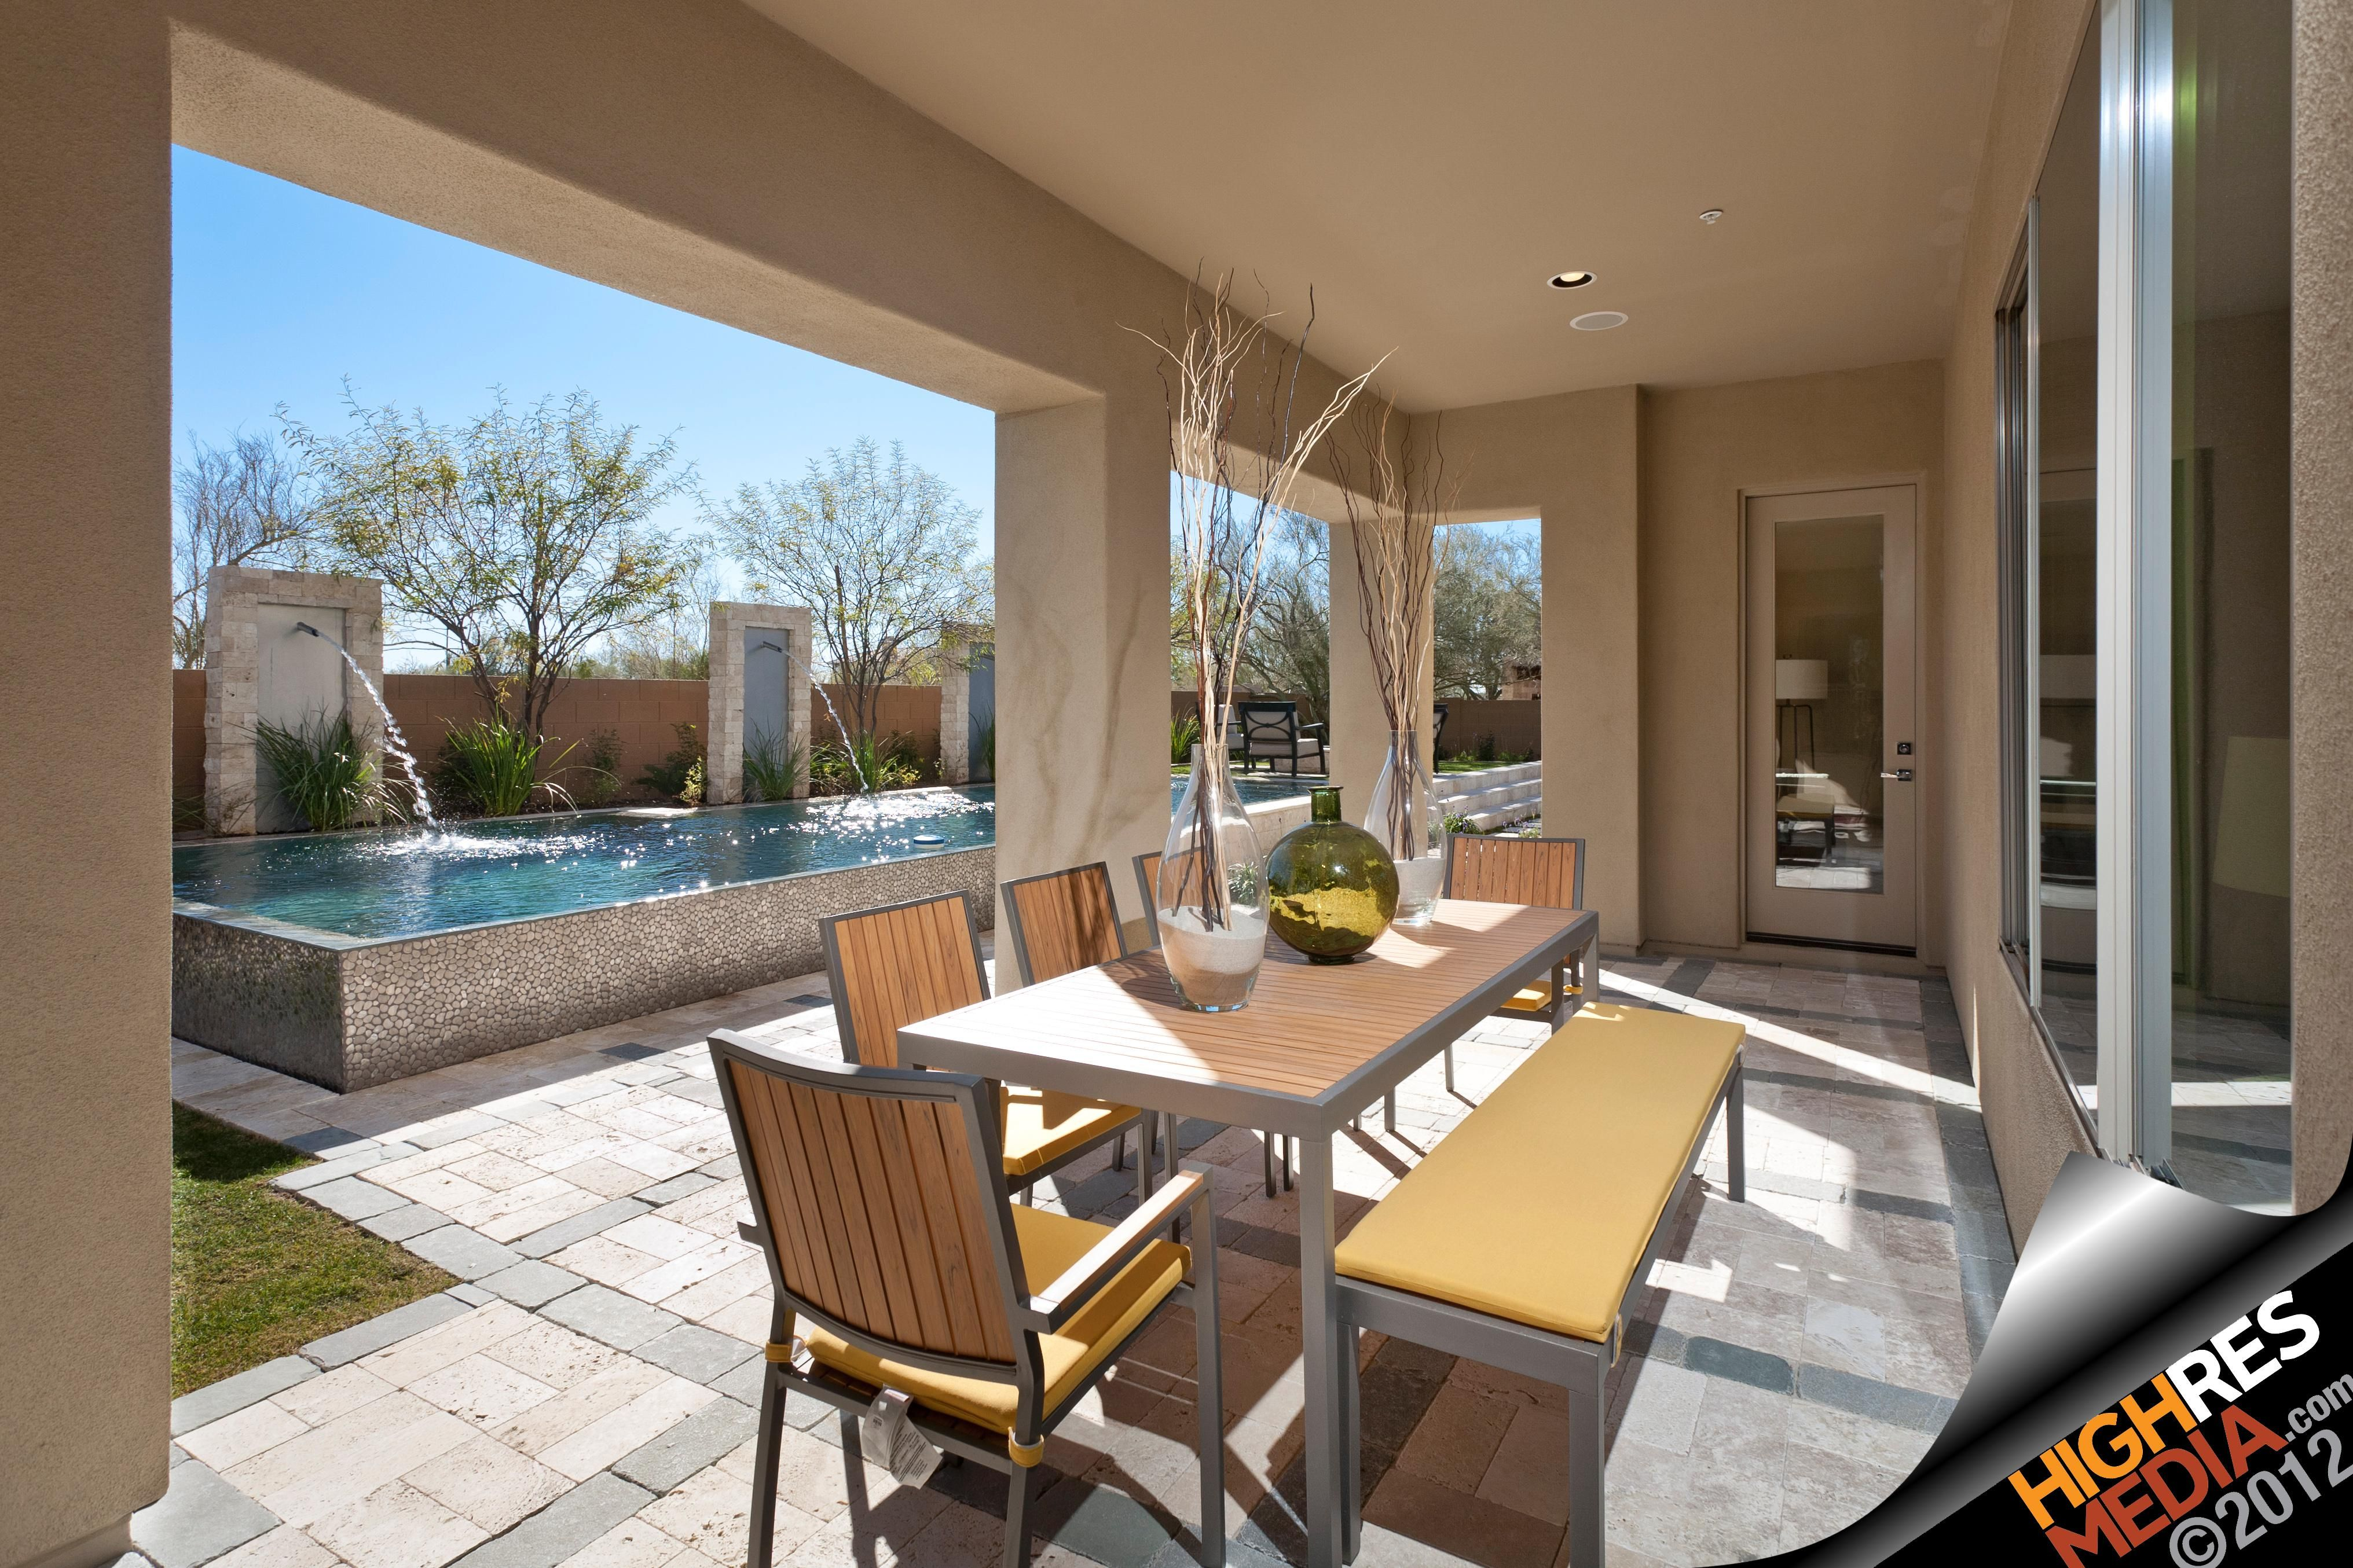 Luxury Backyard Patios : Luxury patio and backyard  HOME!! ??  Pinterest